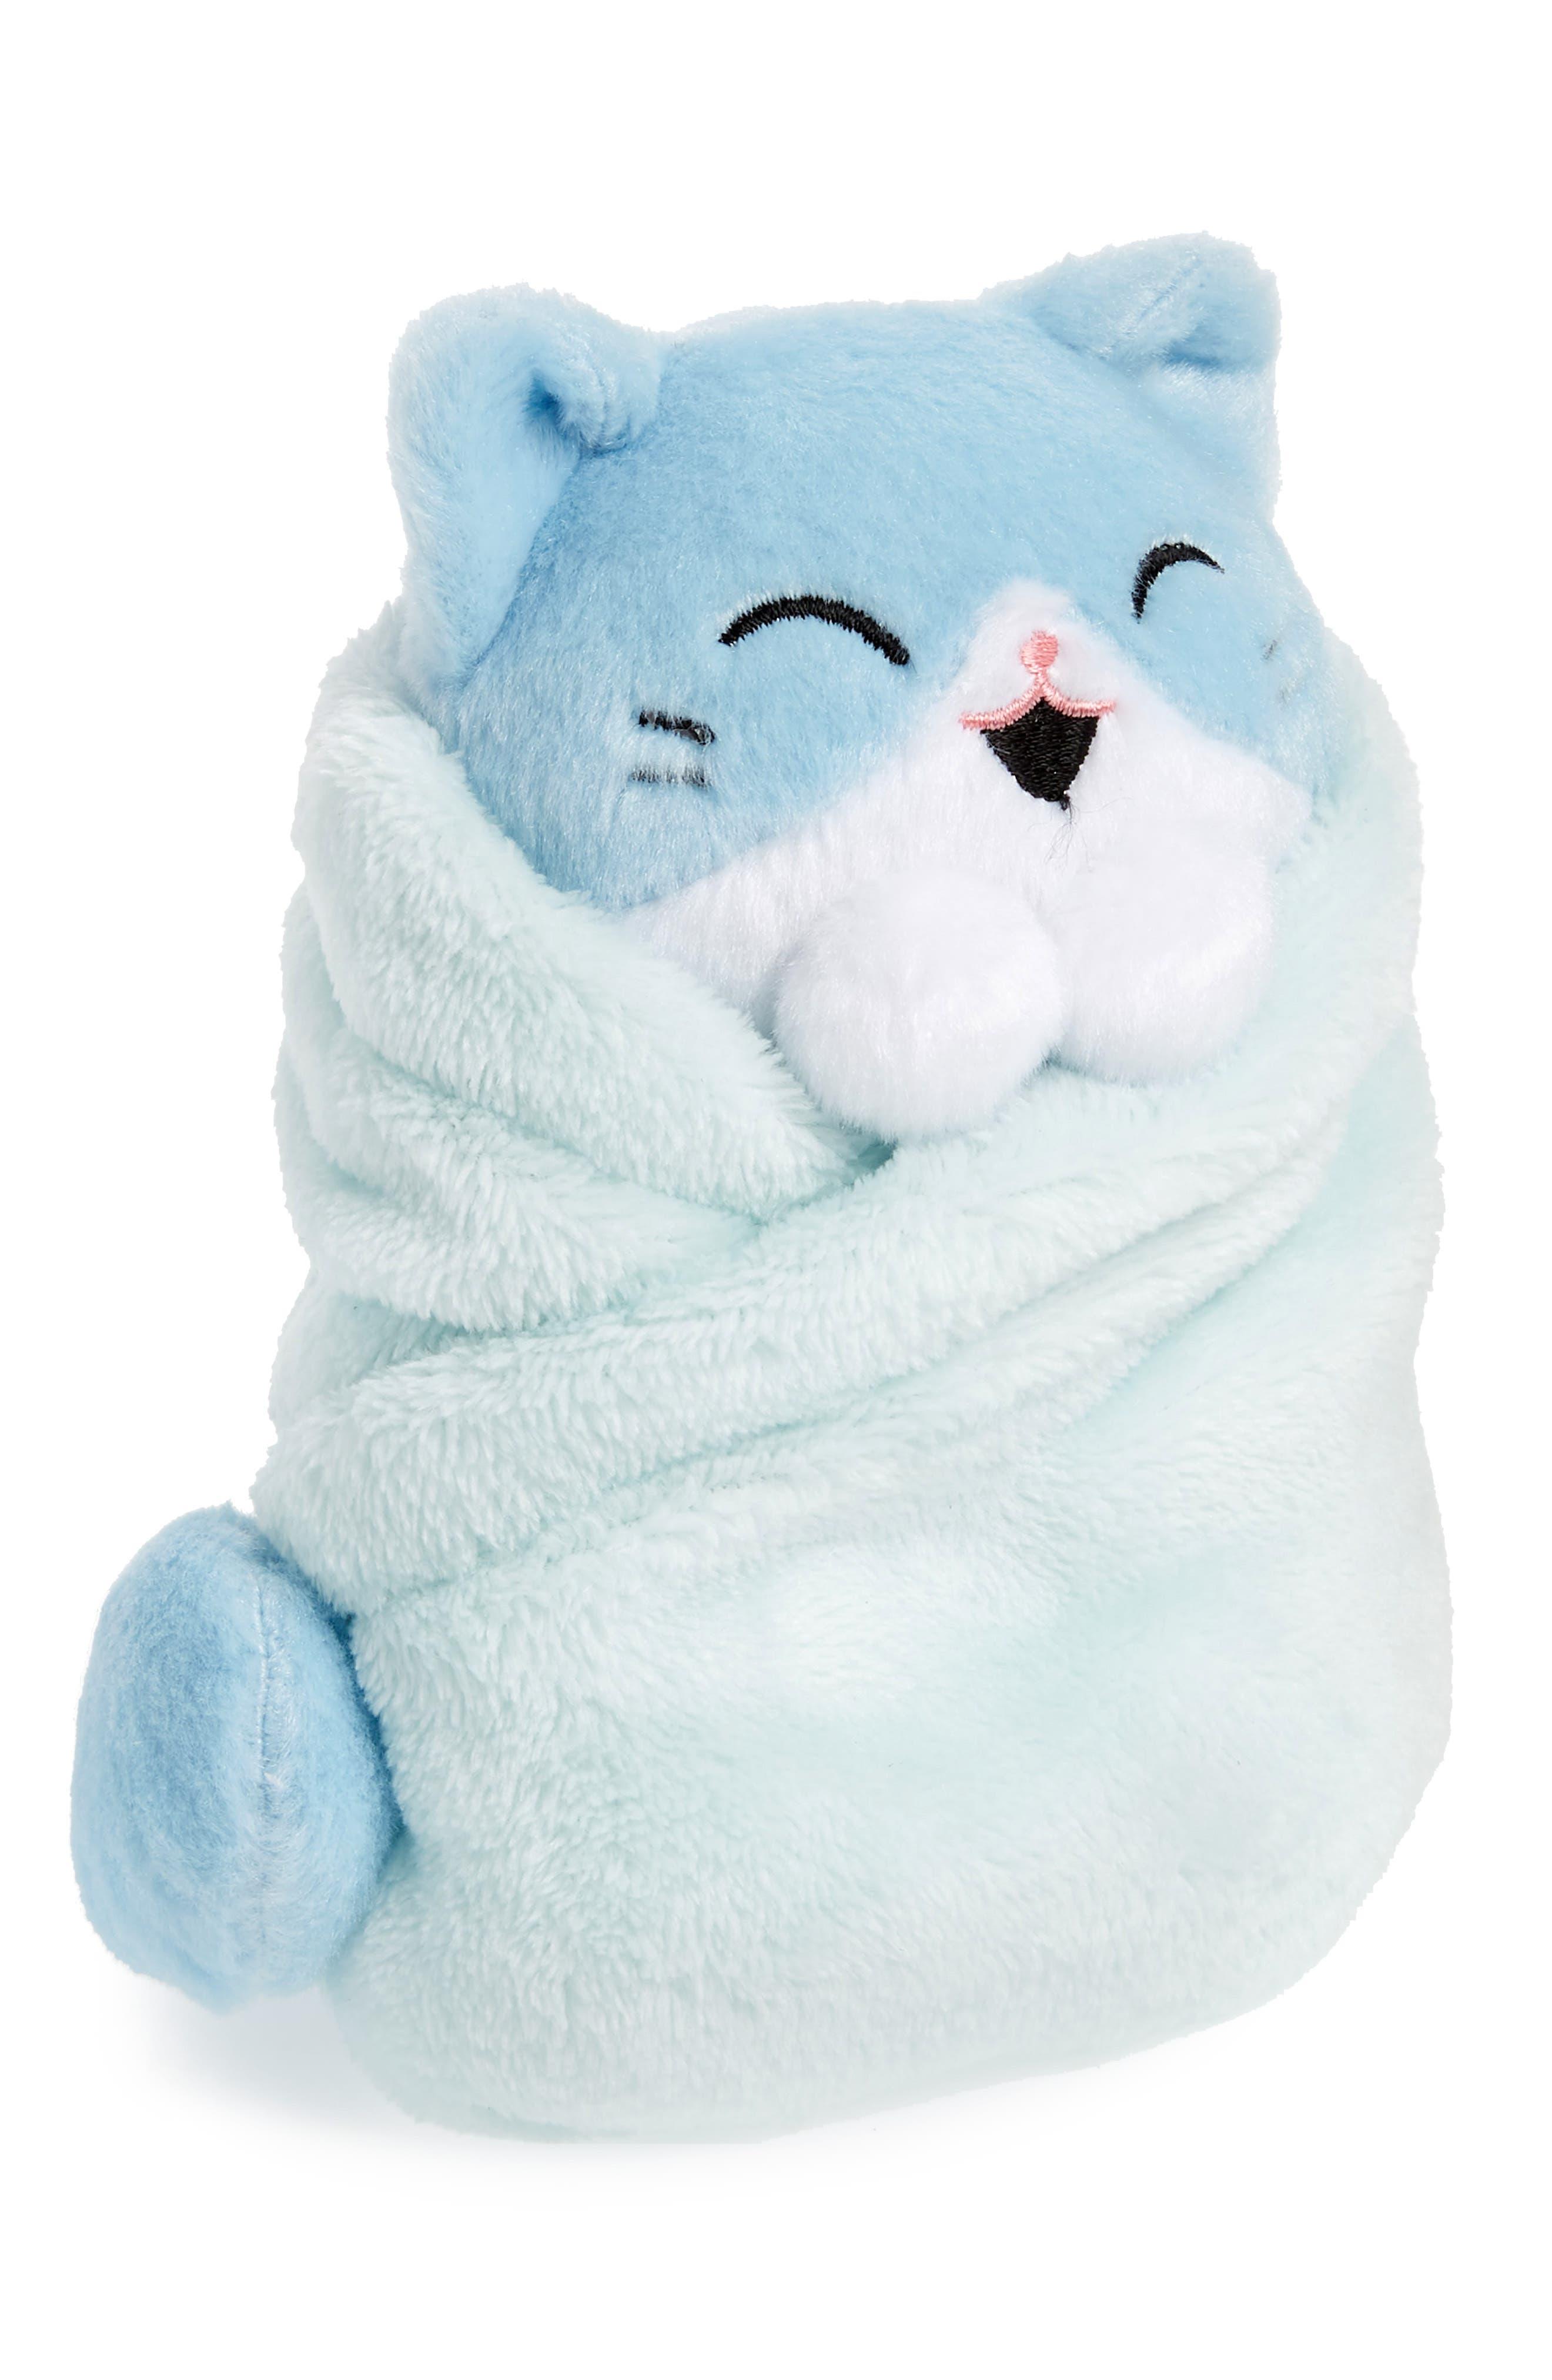 Purritos - Tuna Stuffed Toy,                             Main thumbnail 1, color,                             450